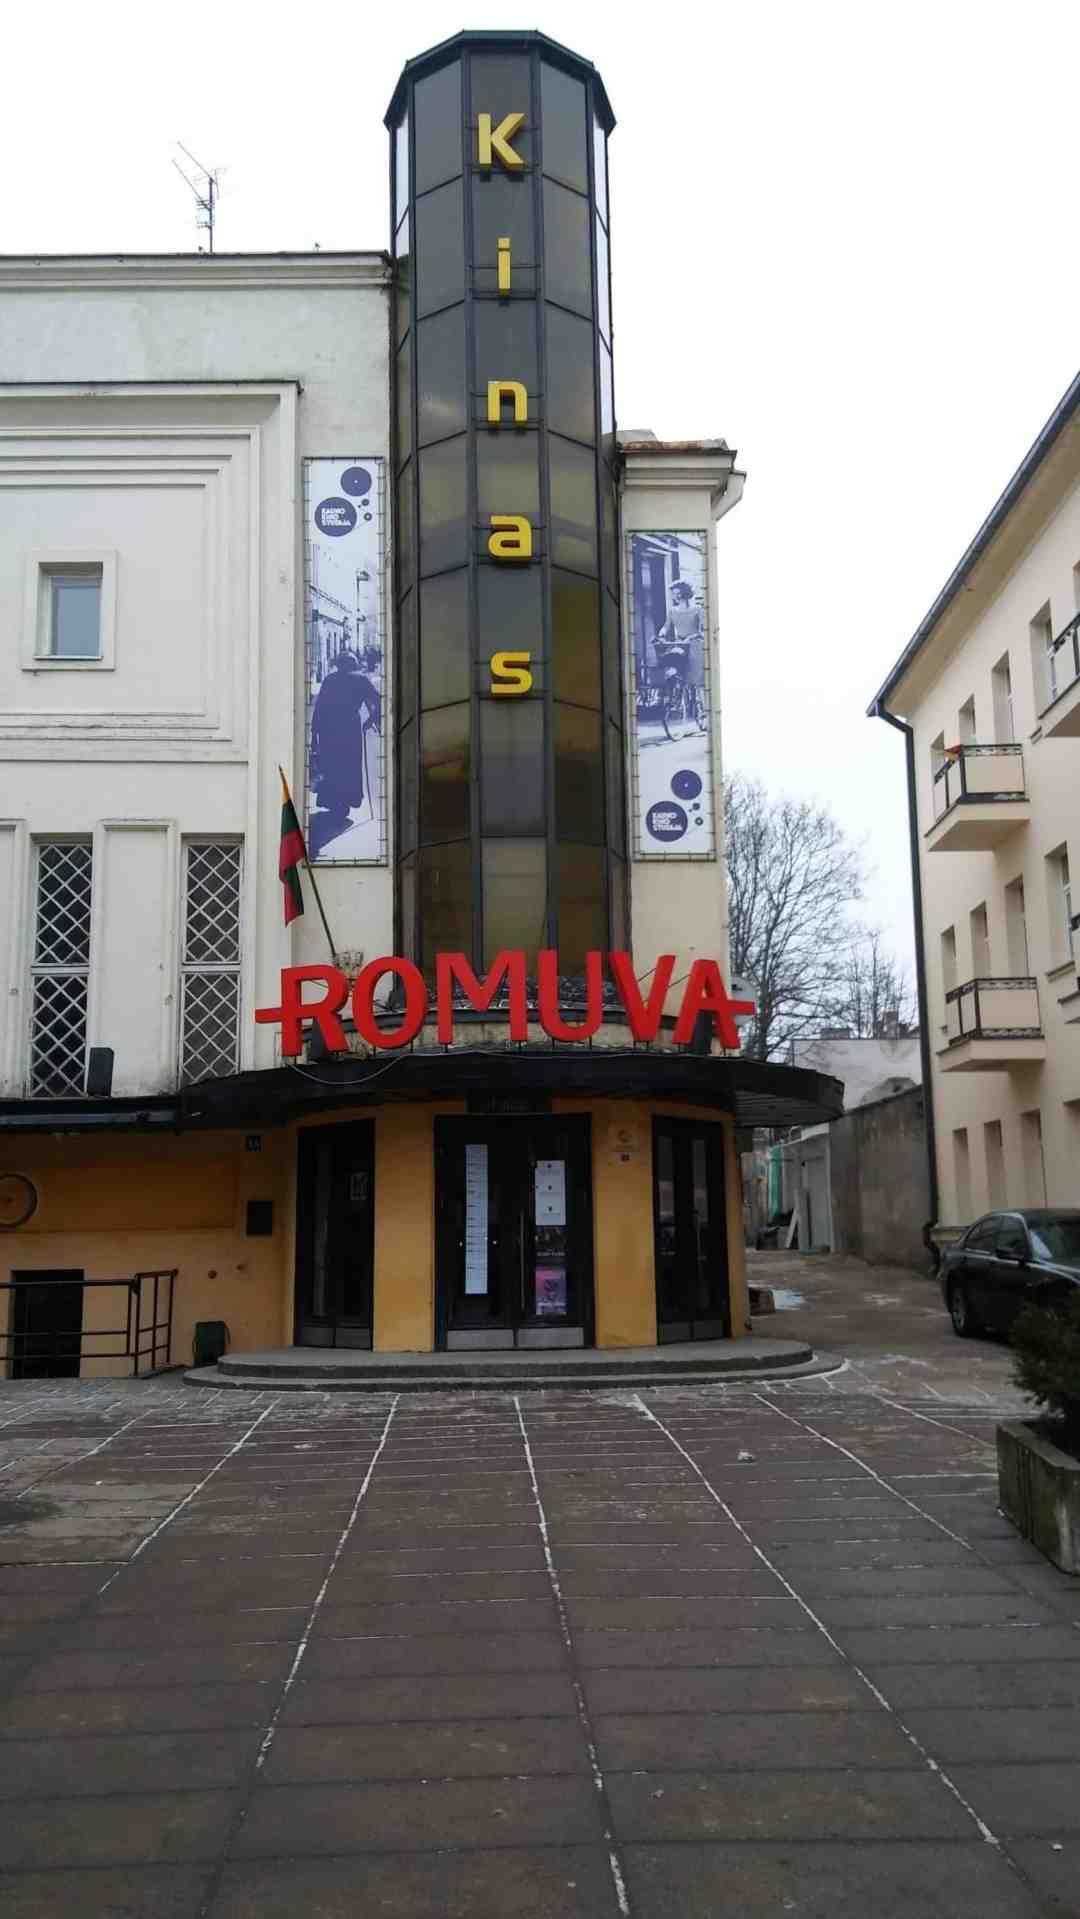 Kaunas, Romuva Cinema, 2018, photo: H. Postawka-Lech